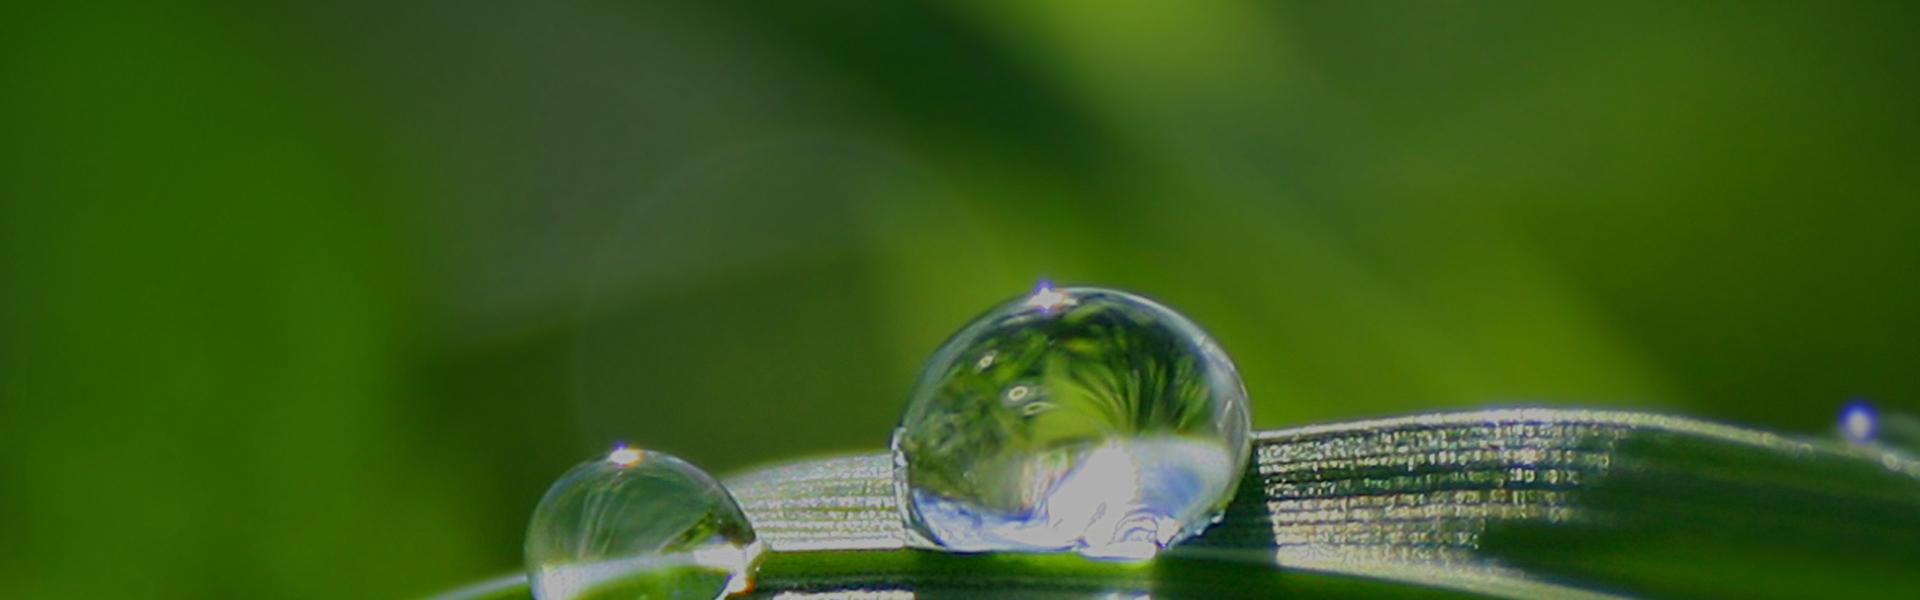 Eco-Friendly Slide